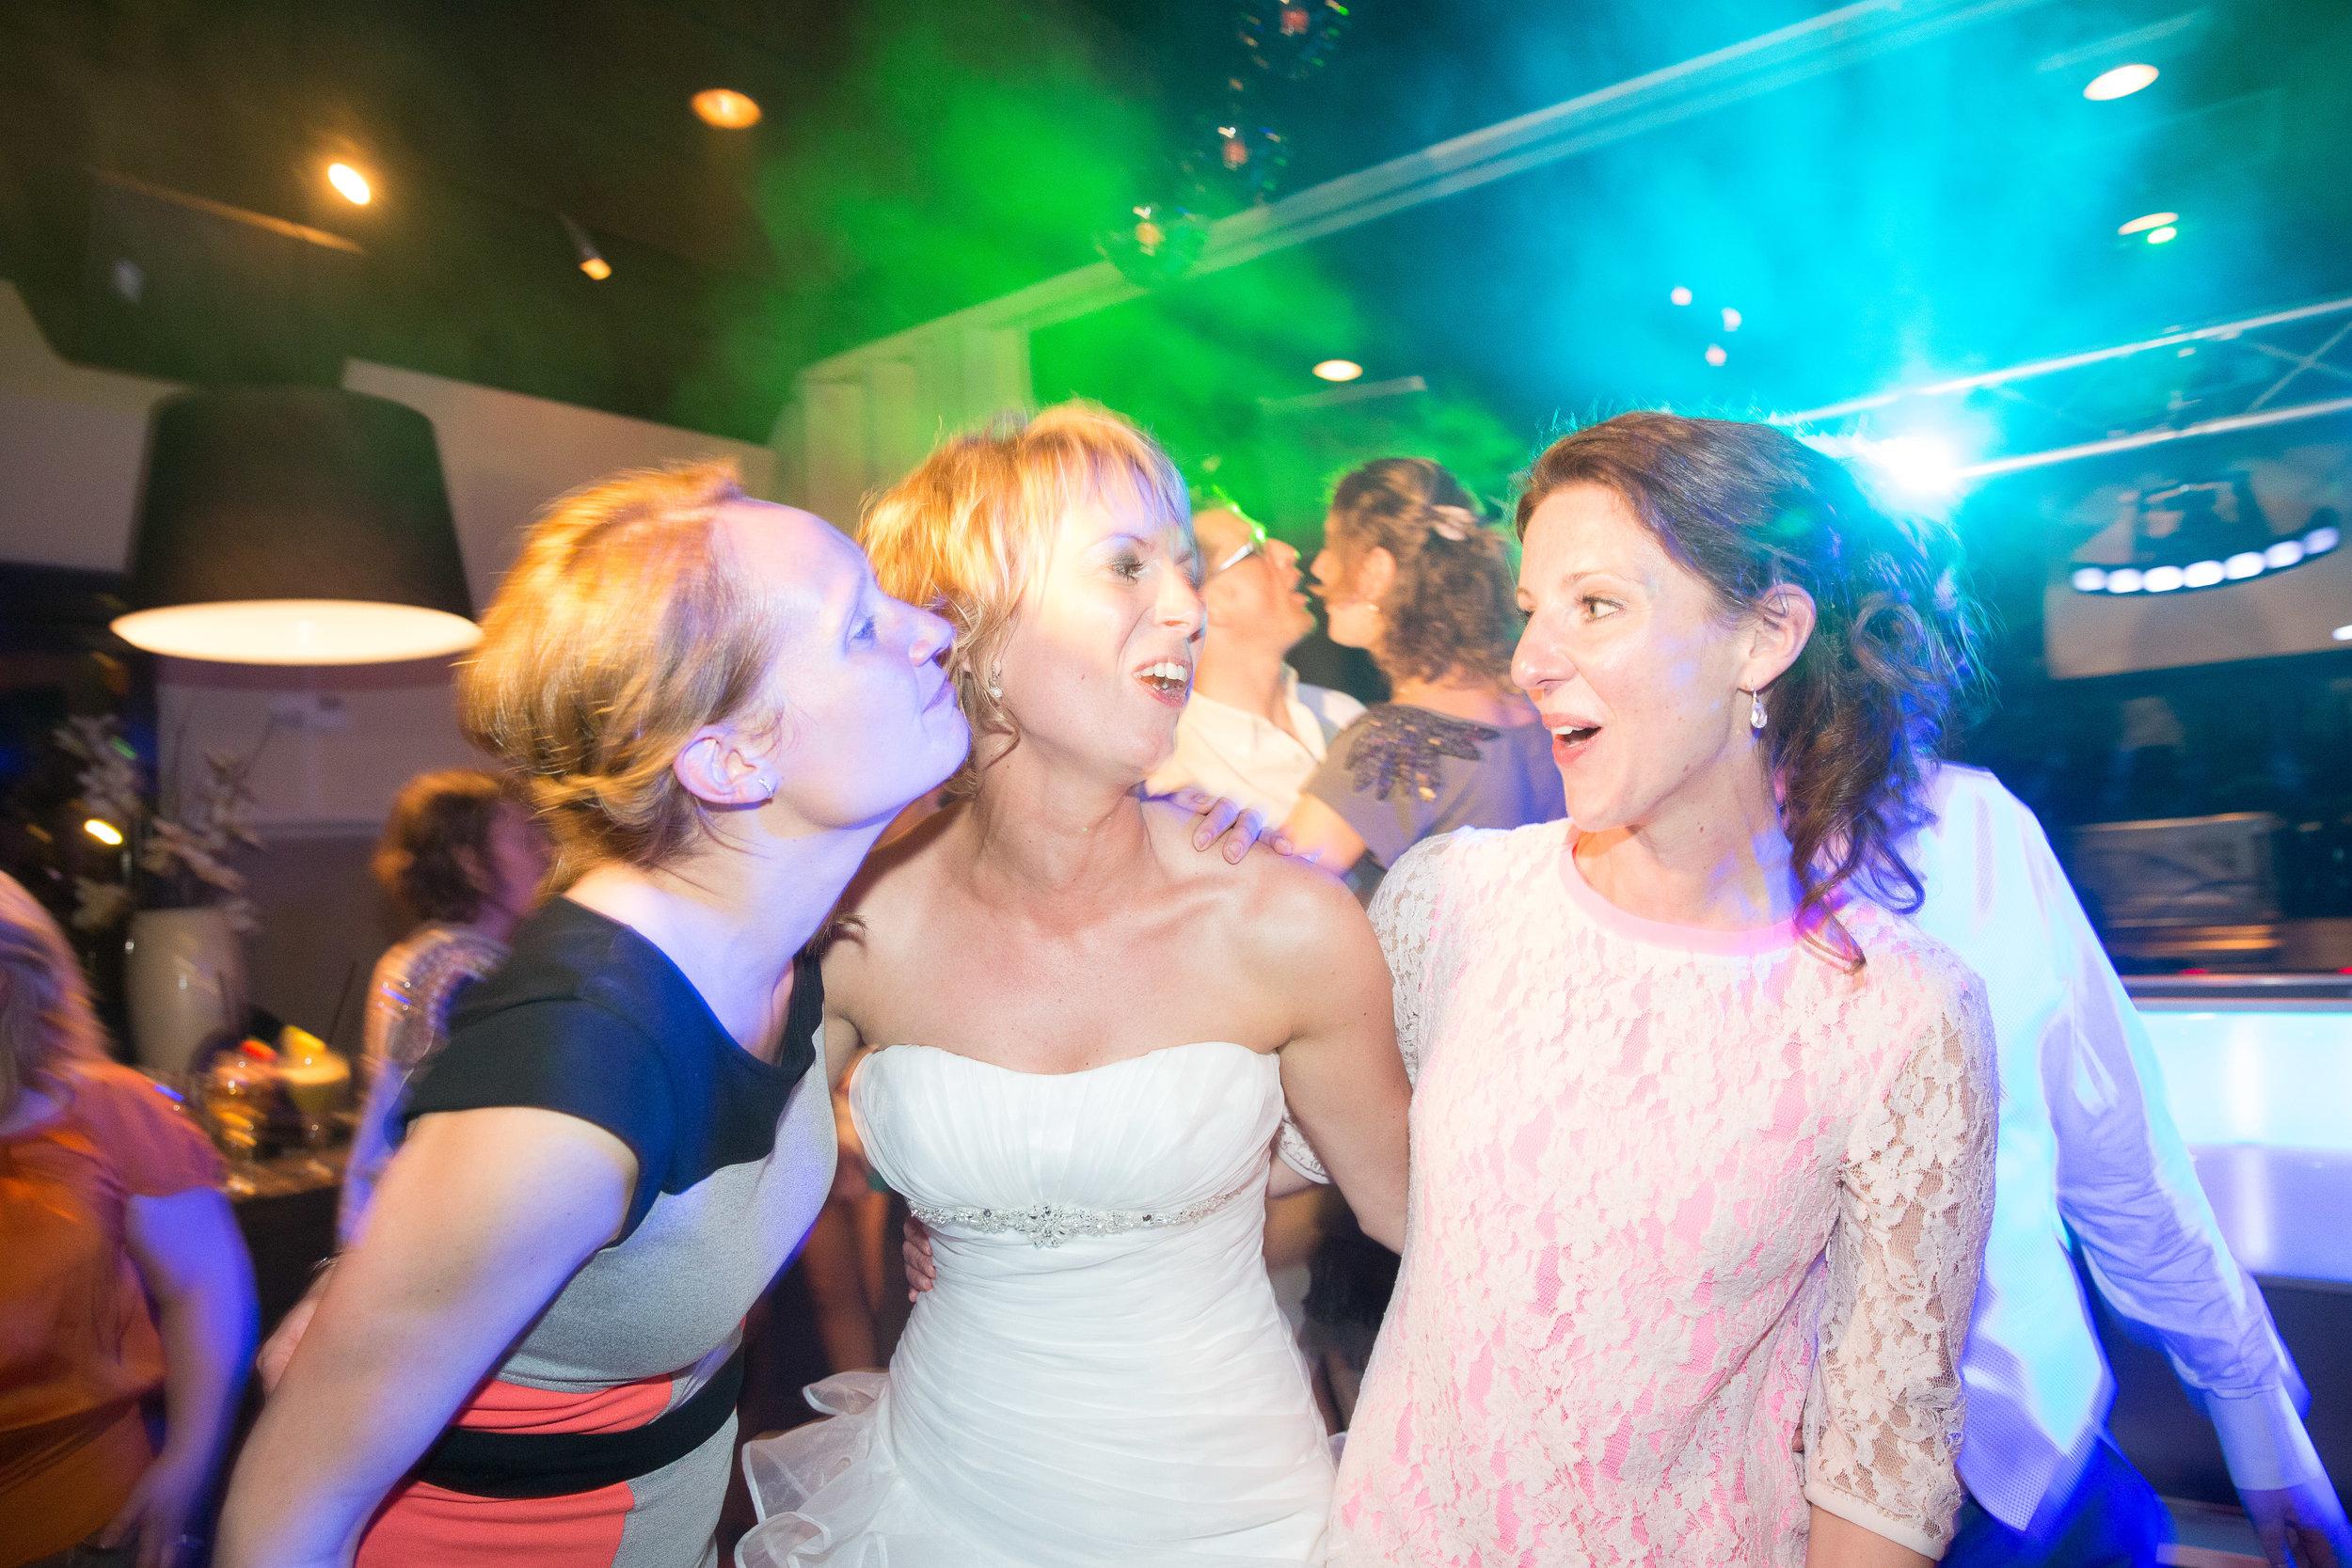 trouwshoot-bruidsfotografie-trouwfoto-feestfotografie-marcel en desiree-298.jpg